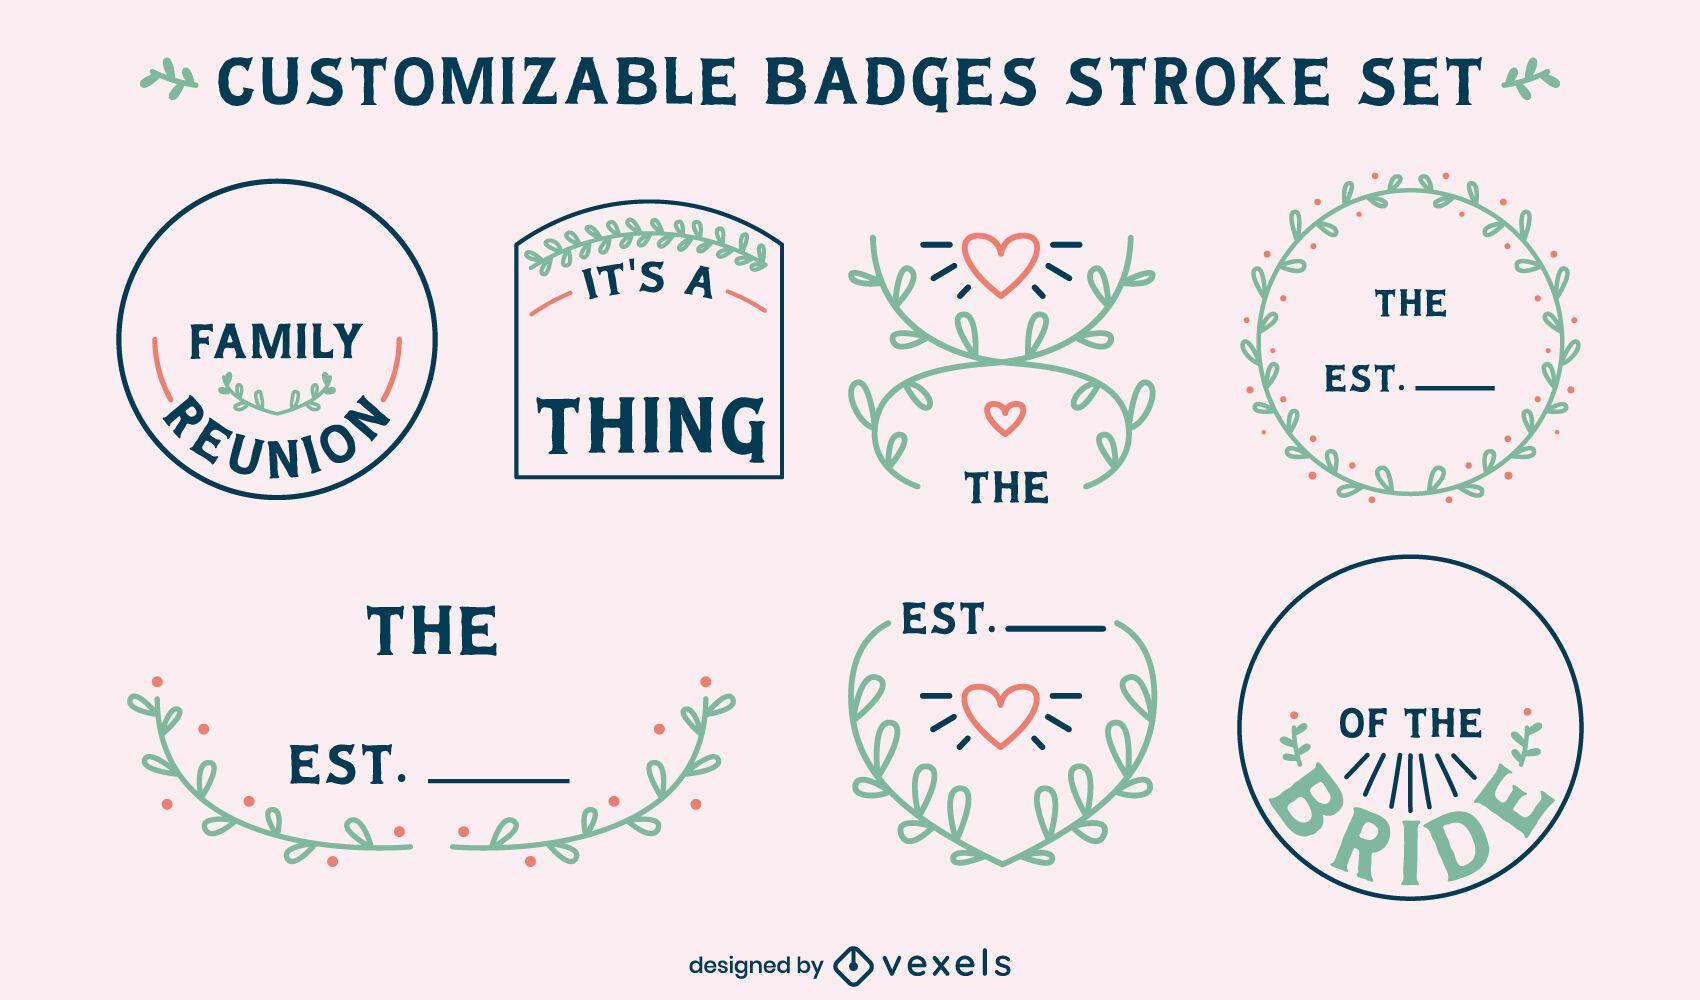 Family badges customizable set